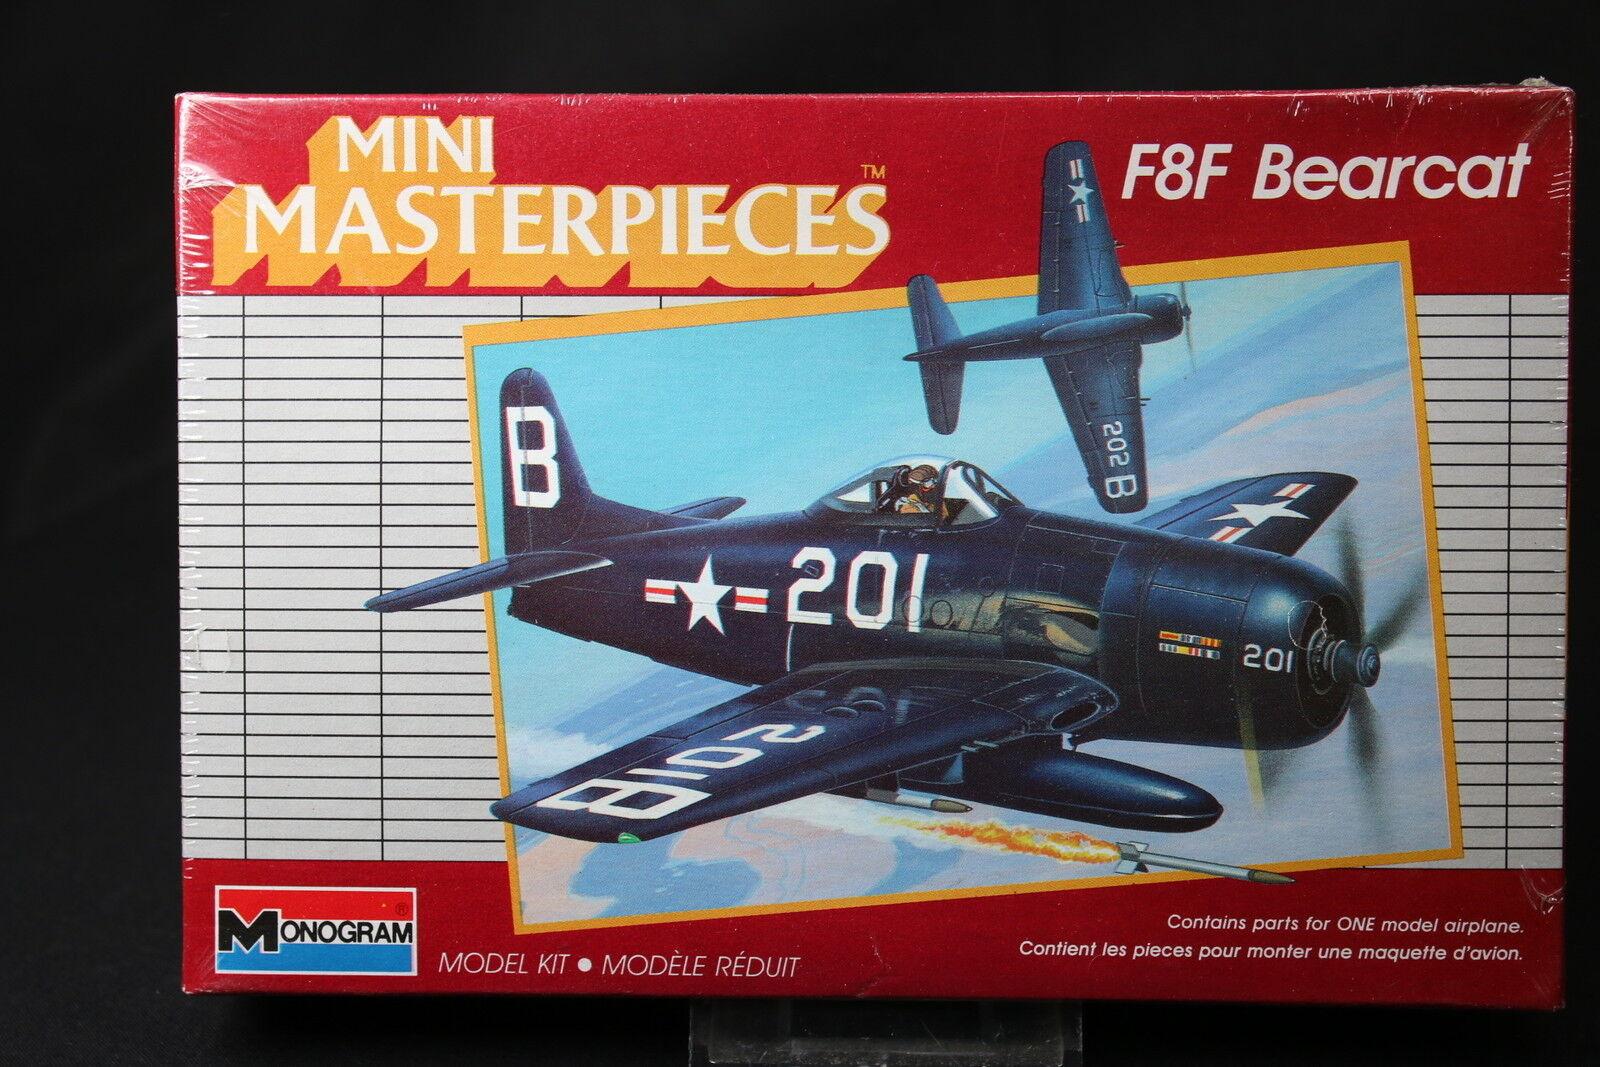 YE062 MONOGRAM 1 72 maquette  avion 5013 F8F Bearcat Mini Masterpieces  bas prix